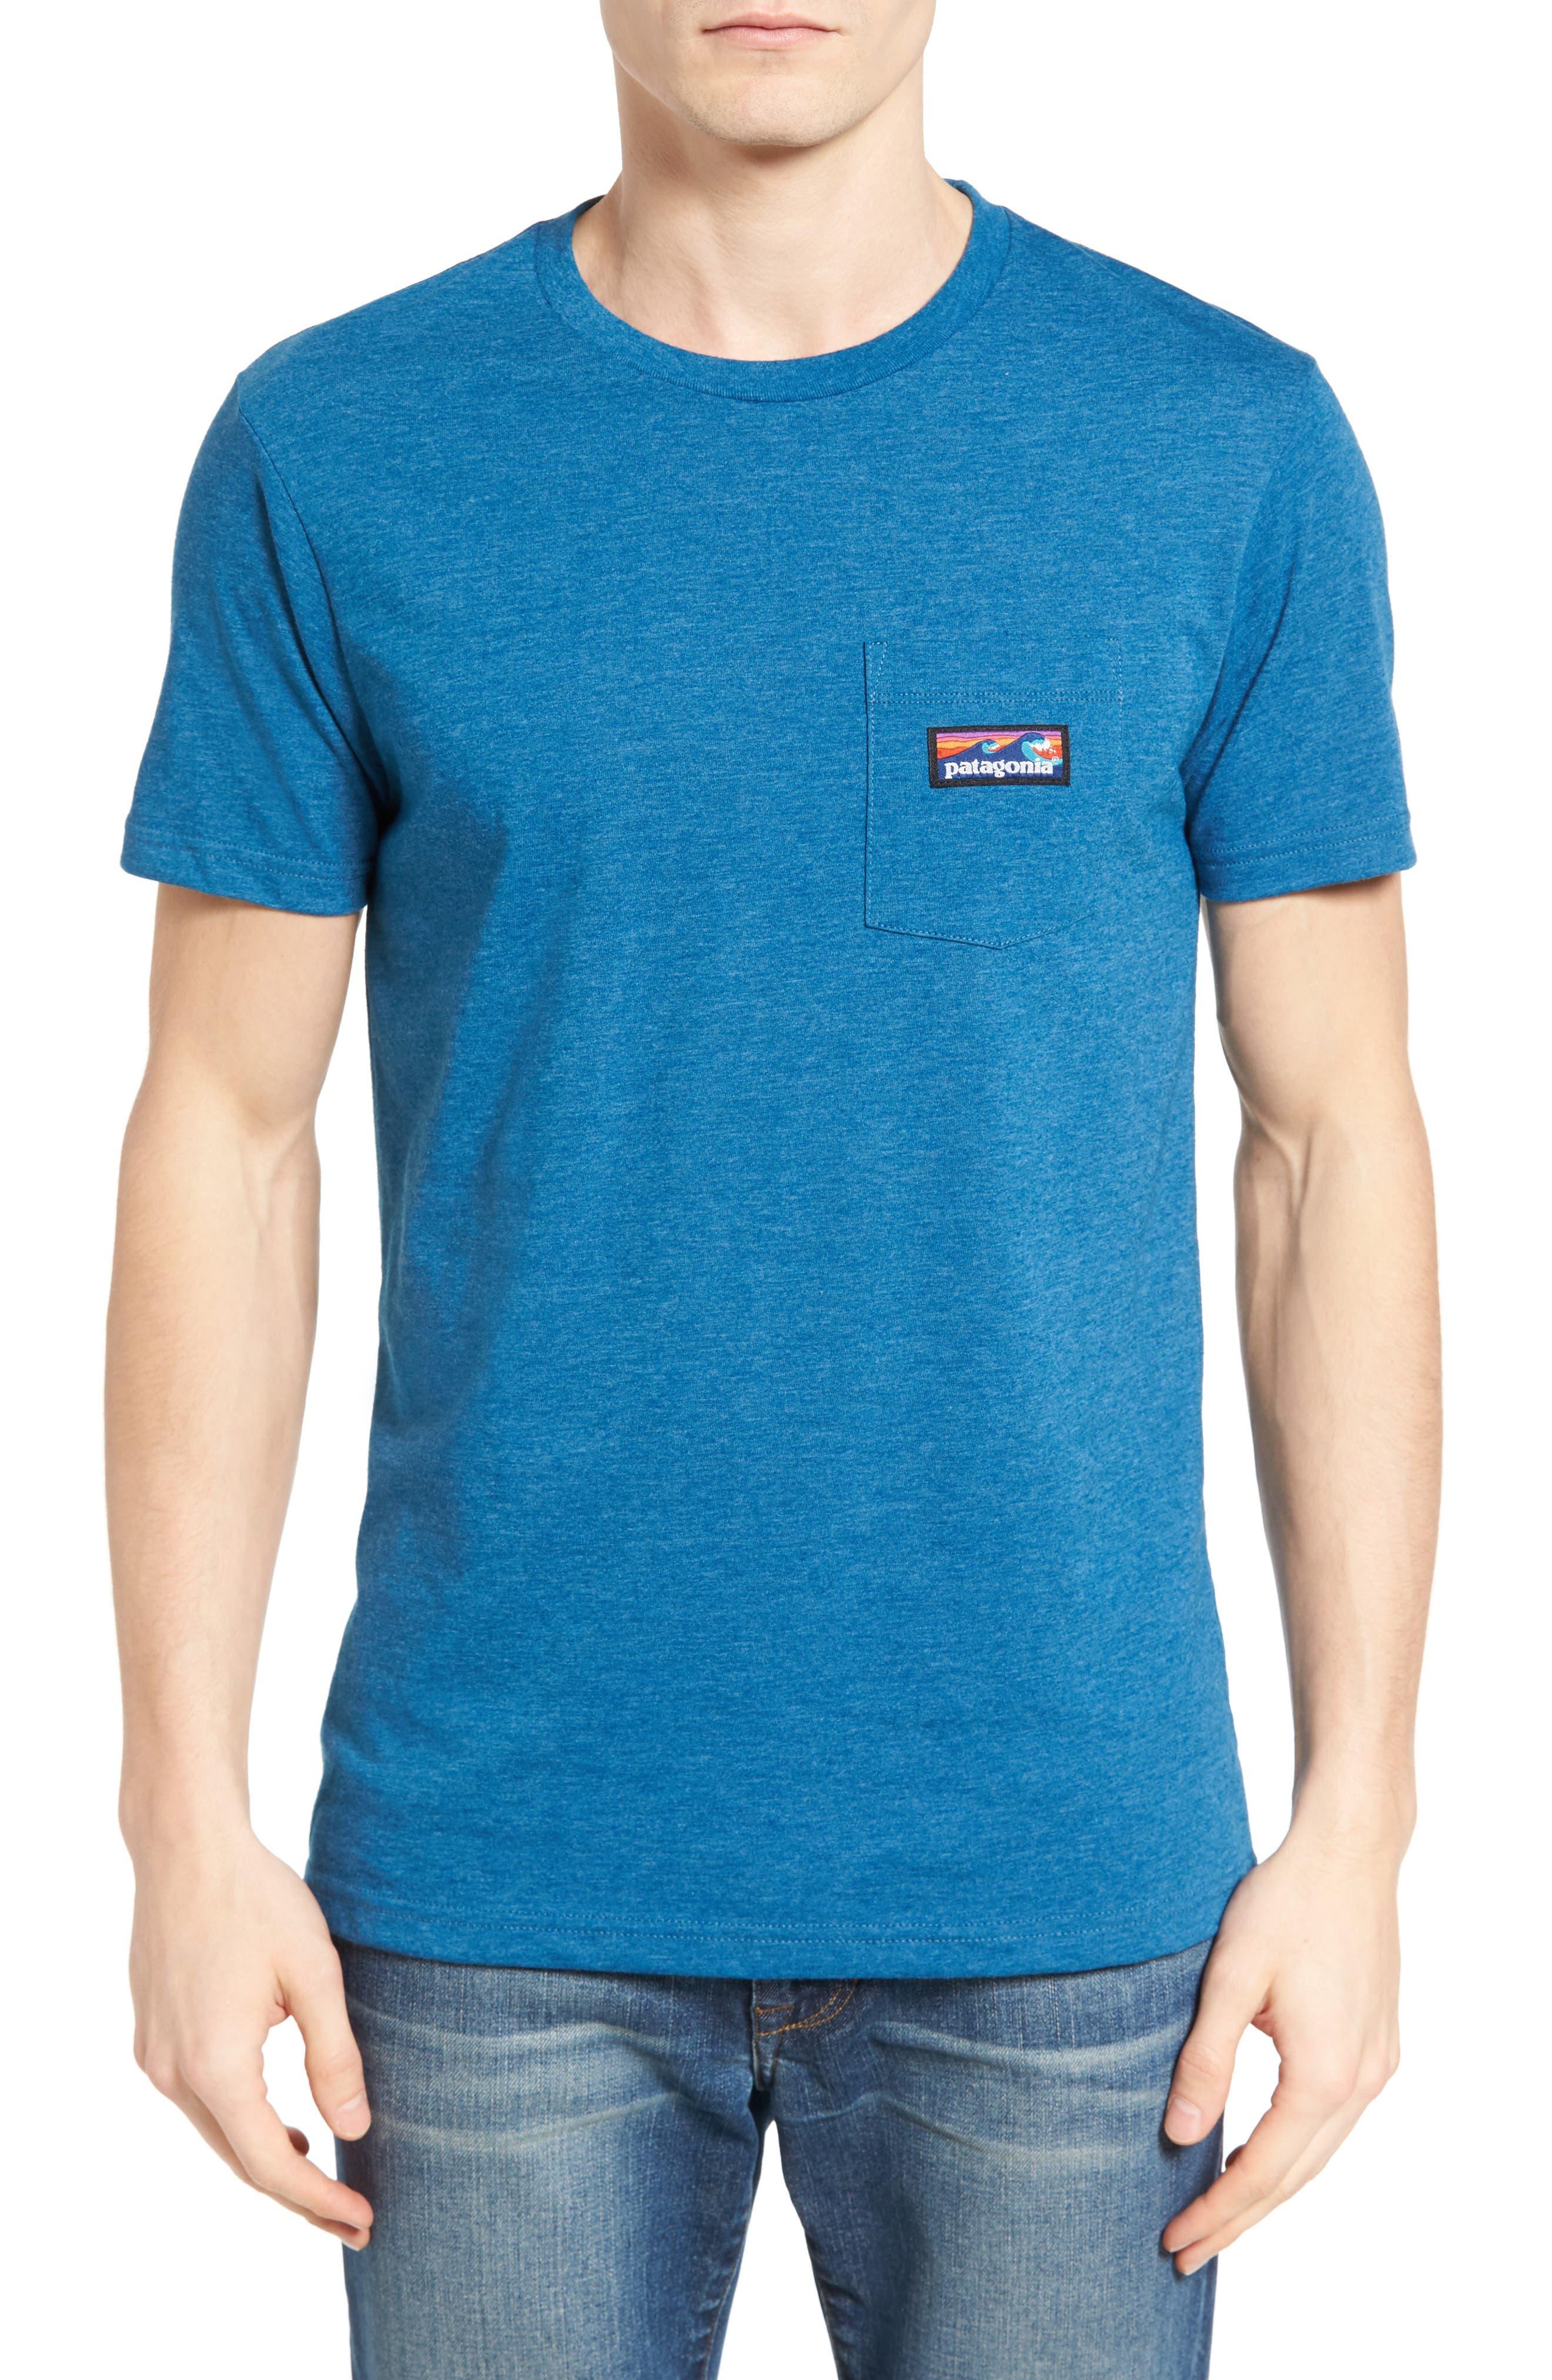 Board Short Label T-Shirt,                         Main,                         color,